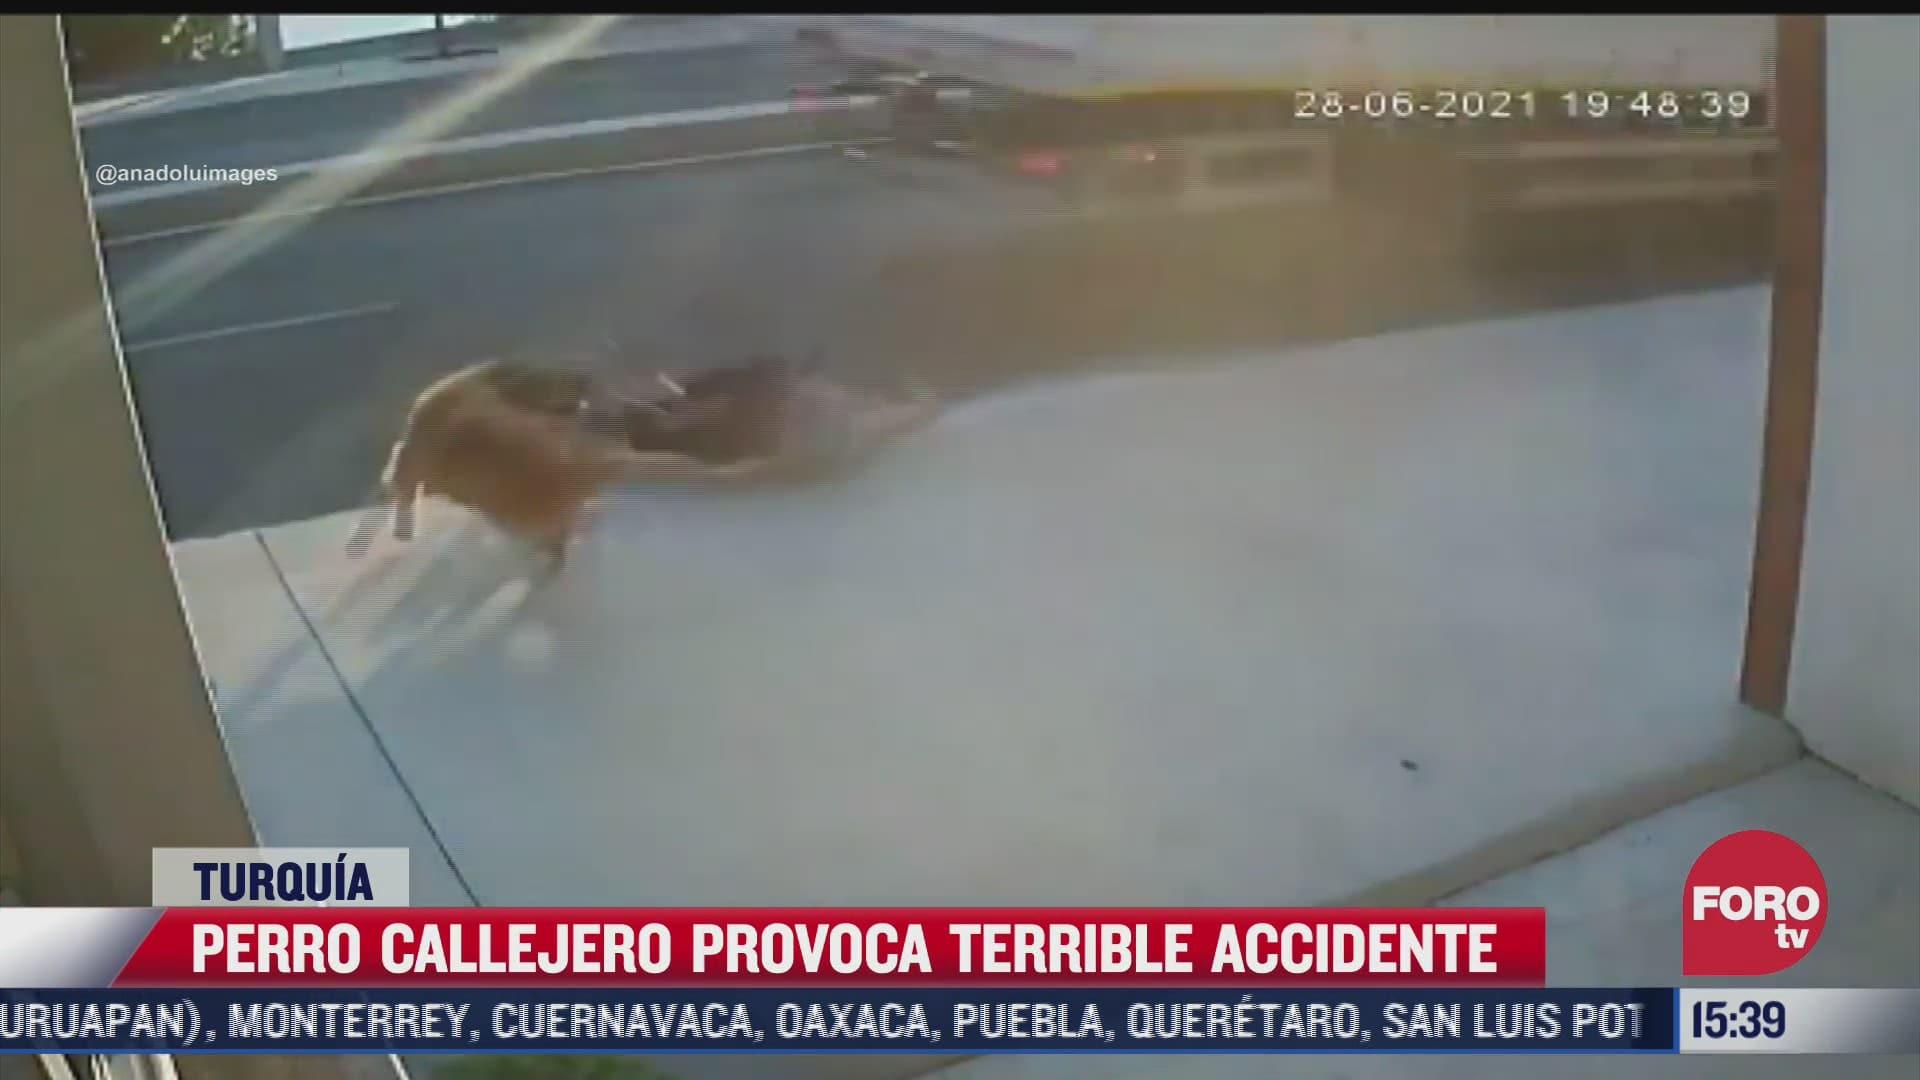 perro callejero provoca terrible accidente en turquia